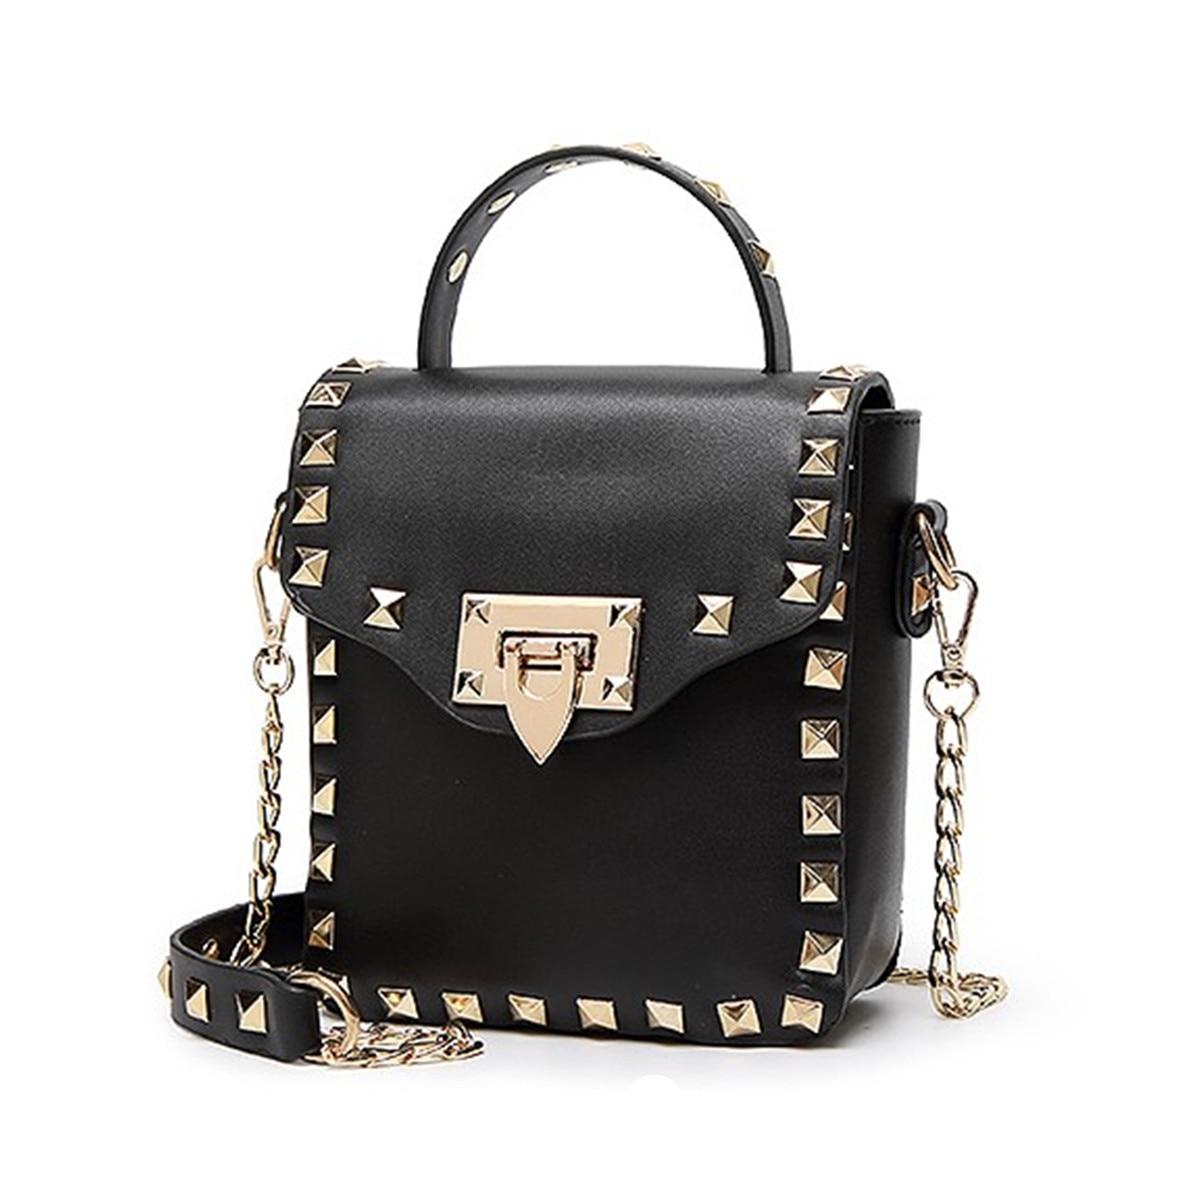 Online Get Cheap Studded Bag -Aliexpress.com | Alibaba Group